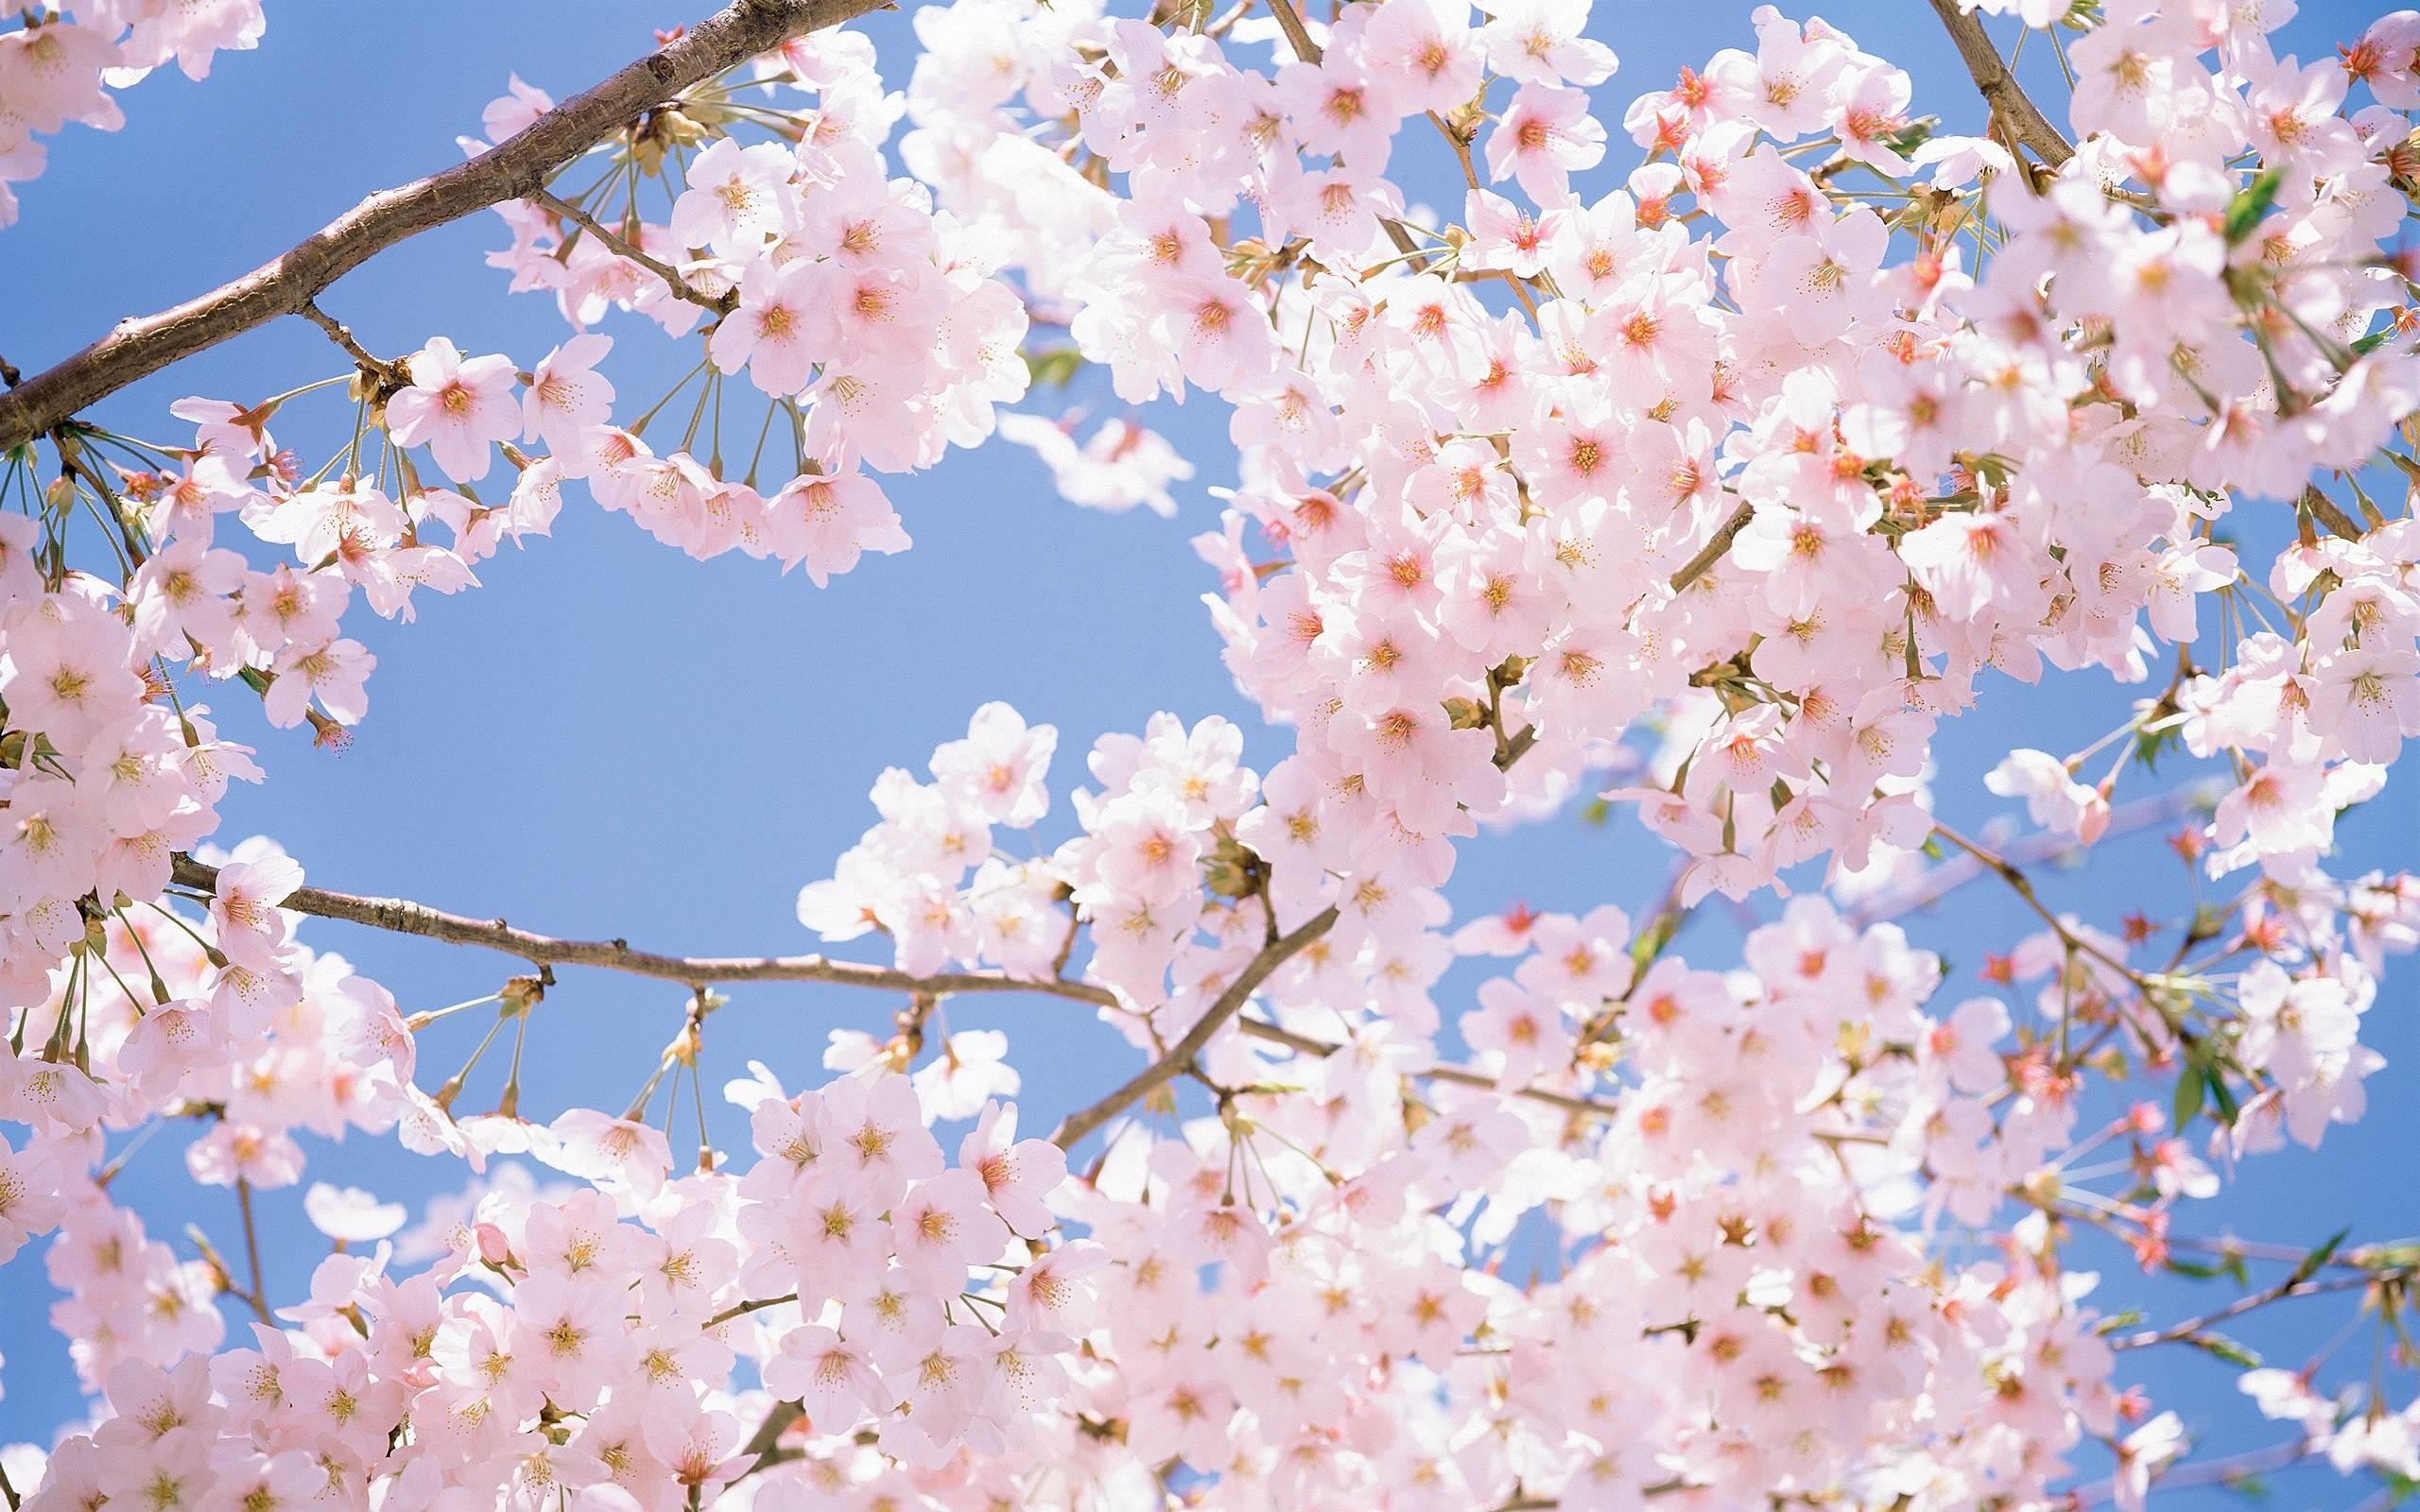 Cherry blossom tree in japan wallpaper 36274